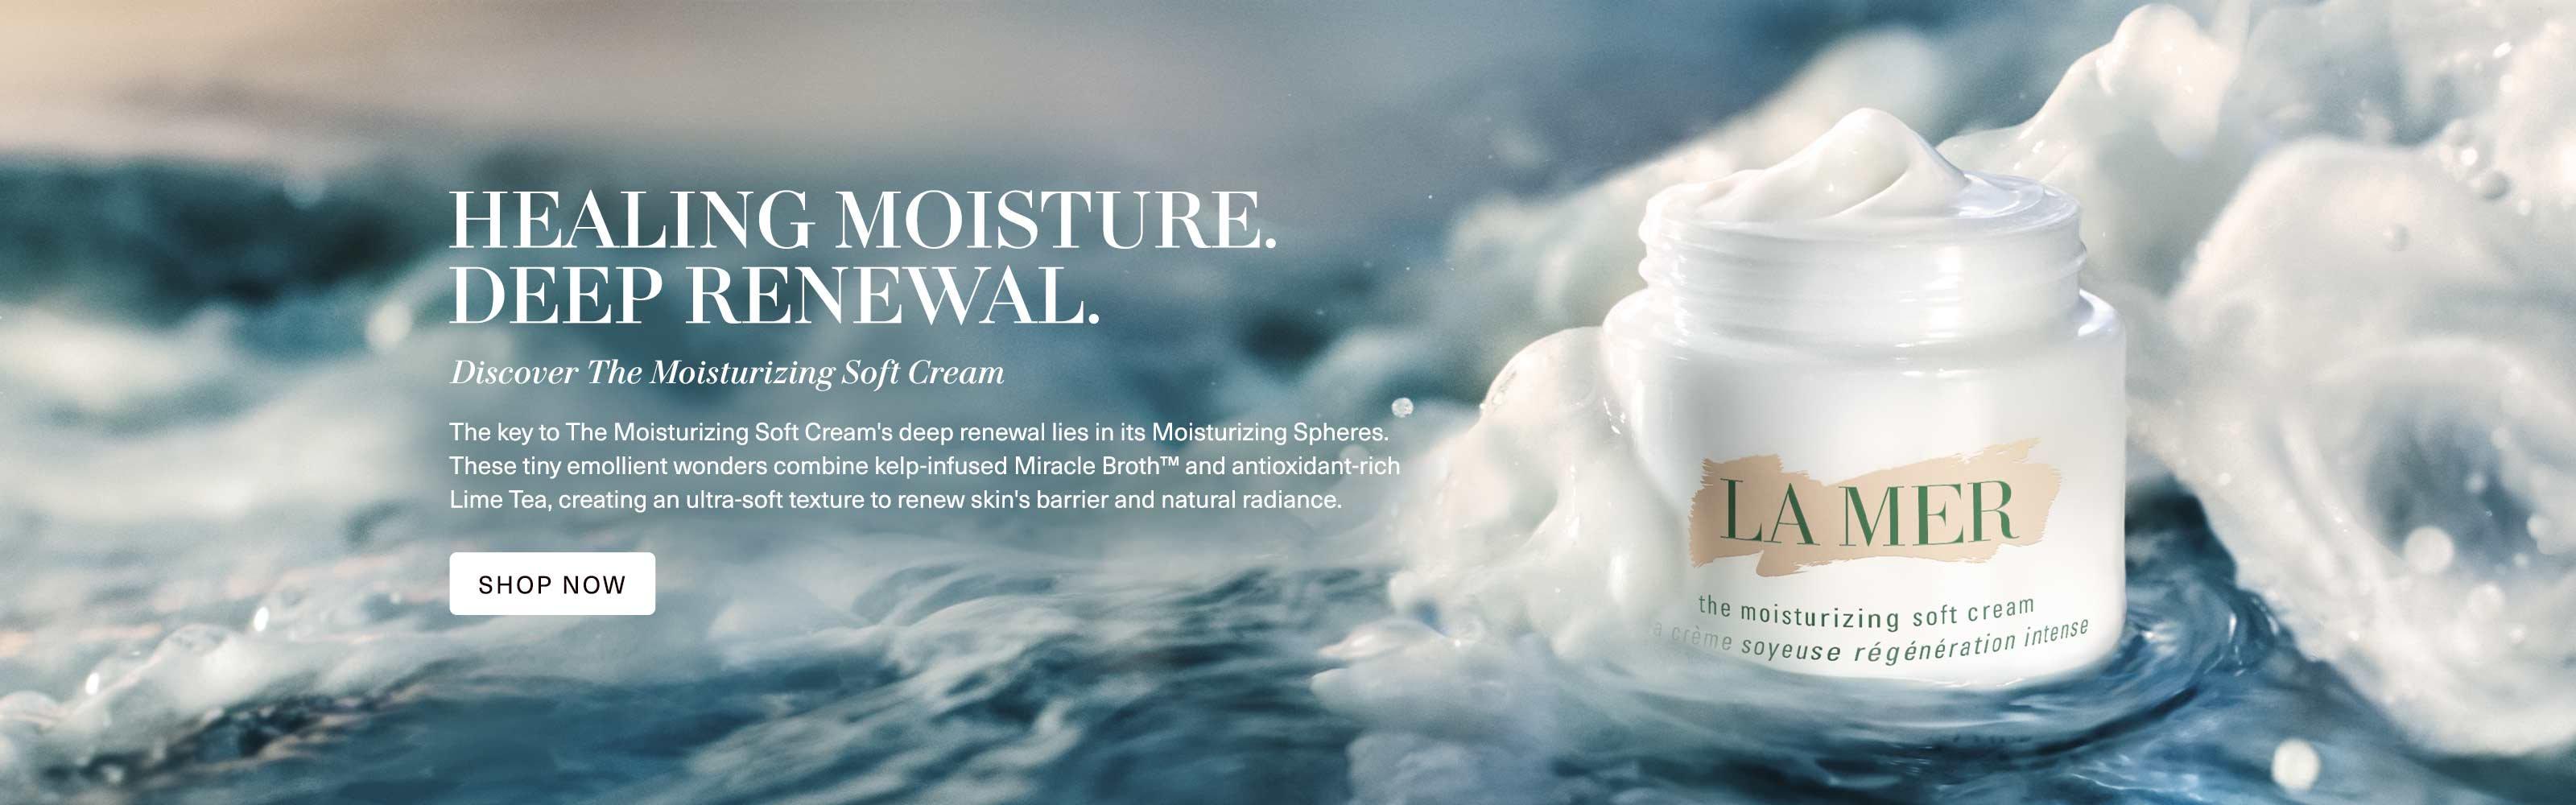 La Mer - Discover The Moisturizing Soft Cream